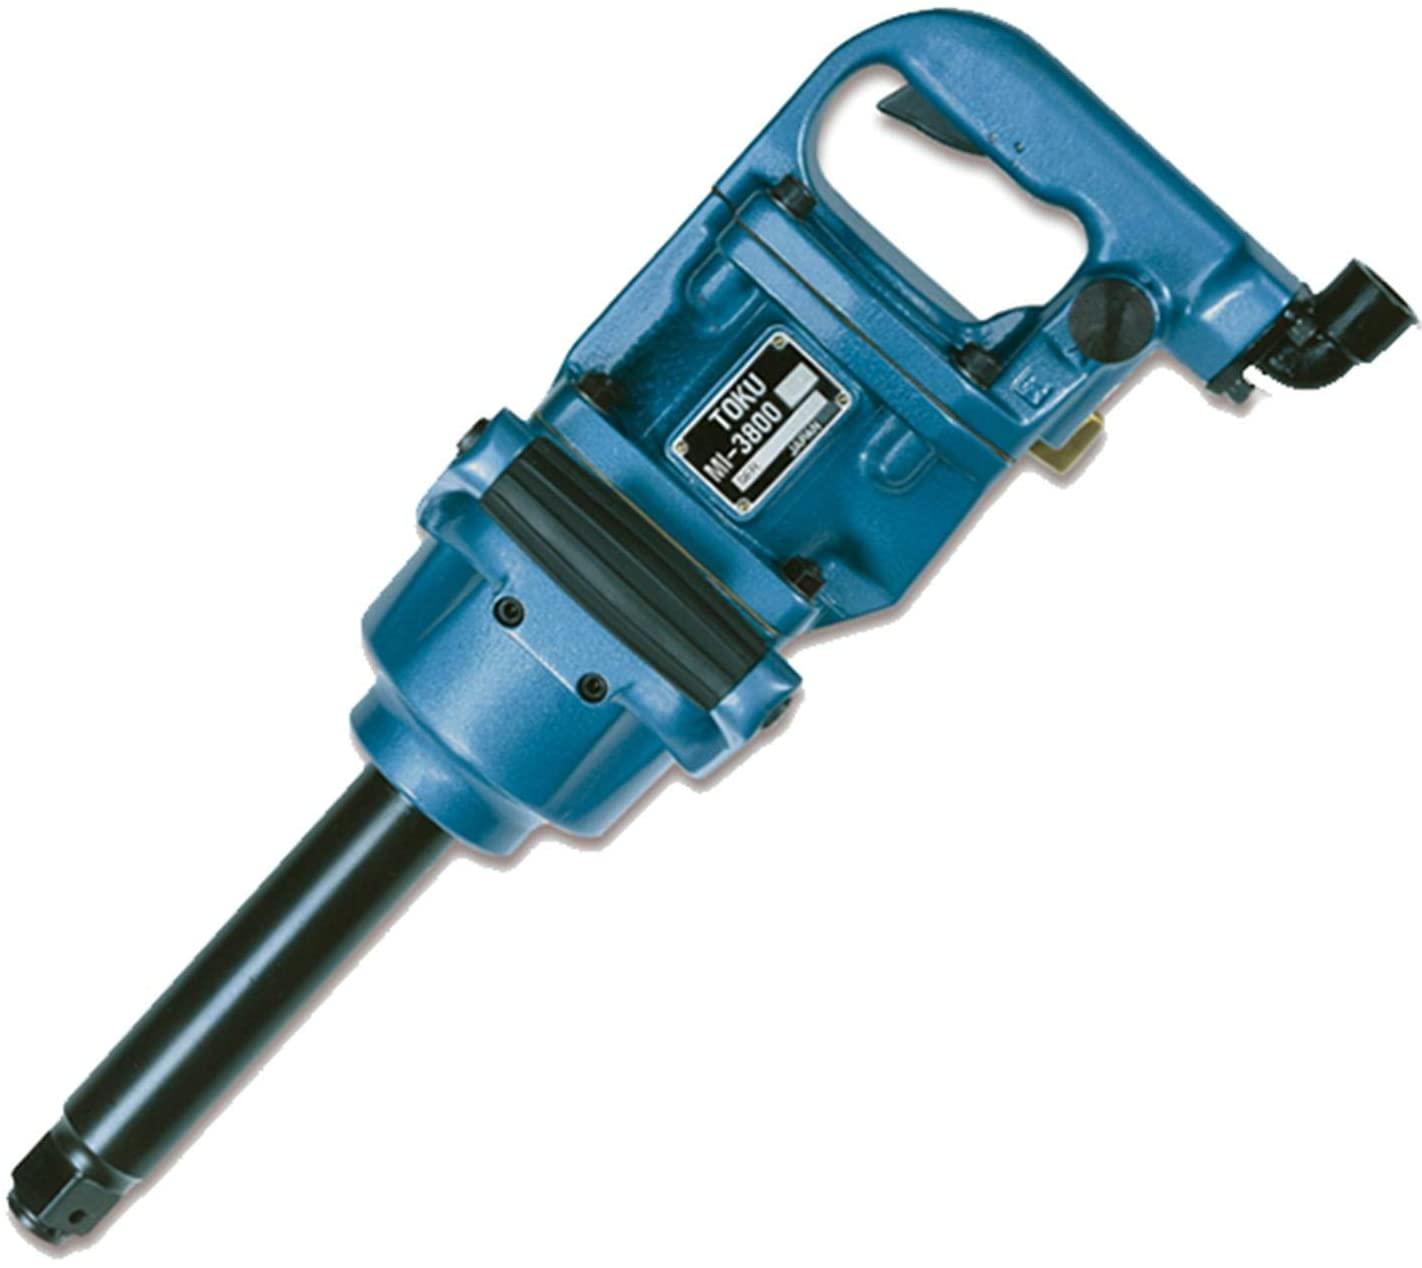 "MI-3800GL 1"" SQ Drive Impact Wrench Toku Japan"